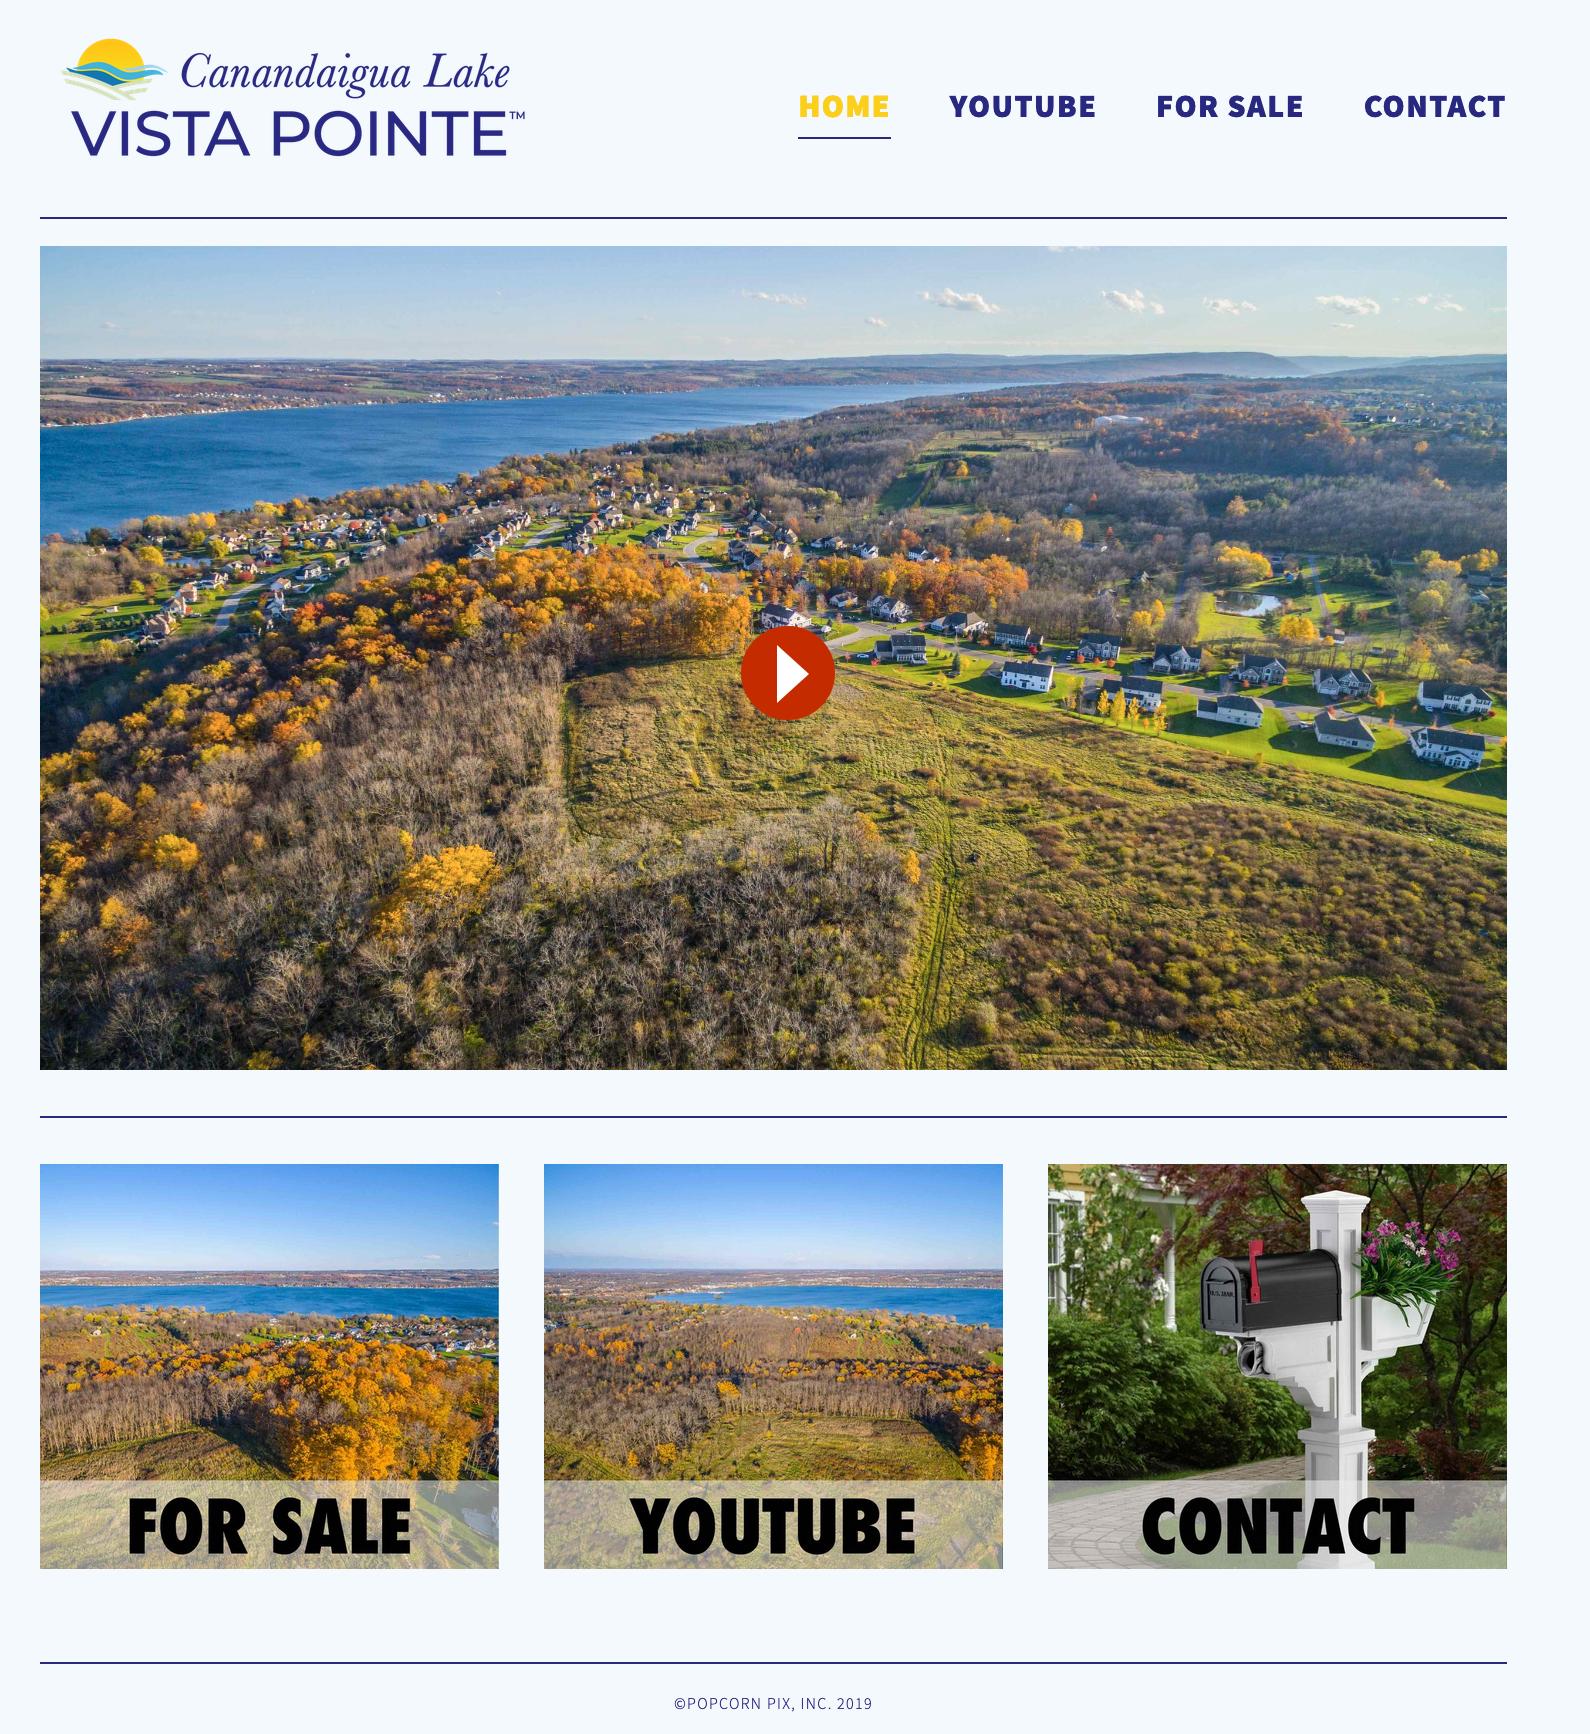 1 Canandaigua Lake Vista Pointe